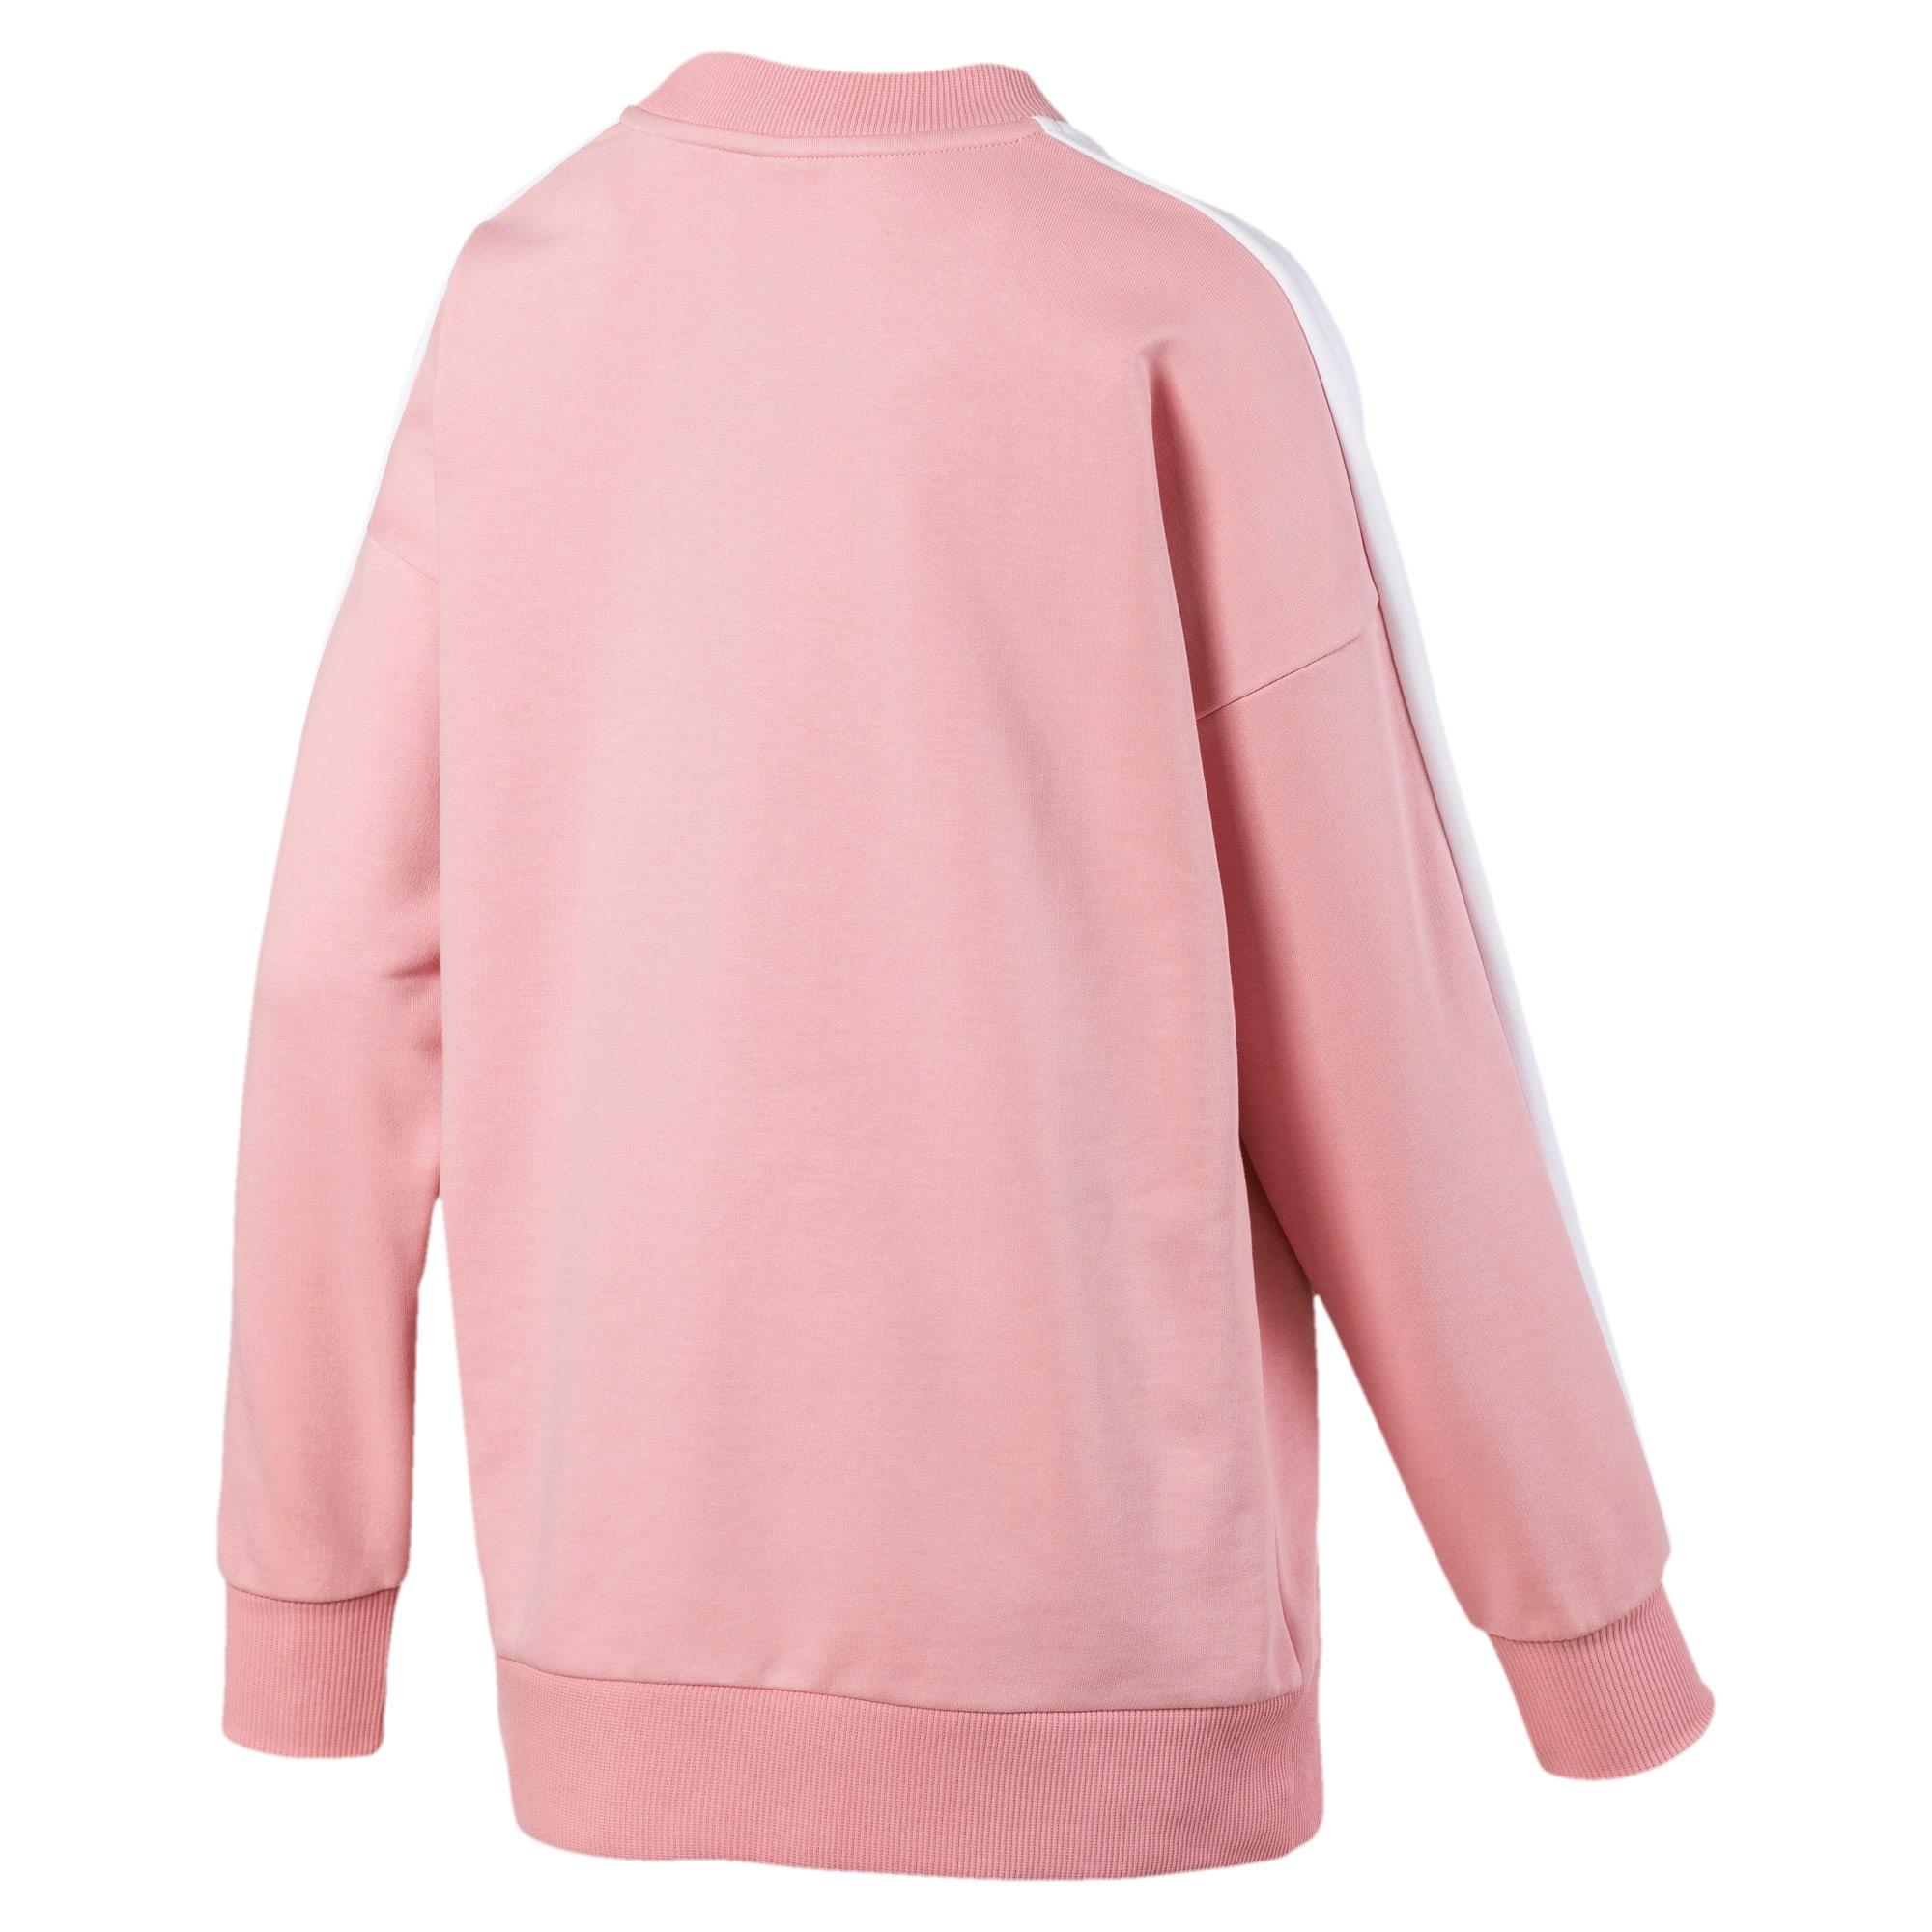 Thumbnail 5 of Classics T7 Women's Crewneck Sweatshirt, Bridal Rose, medium